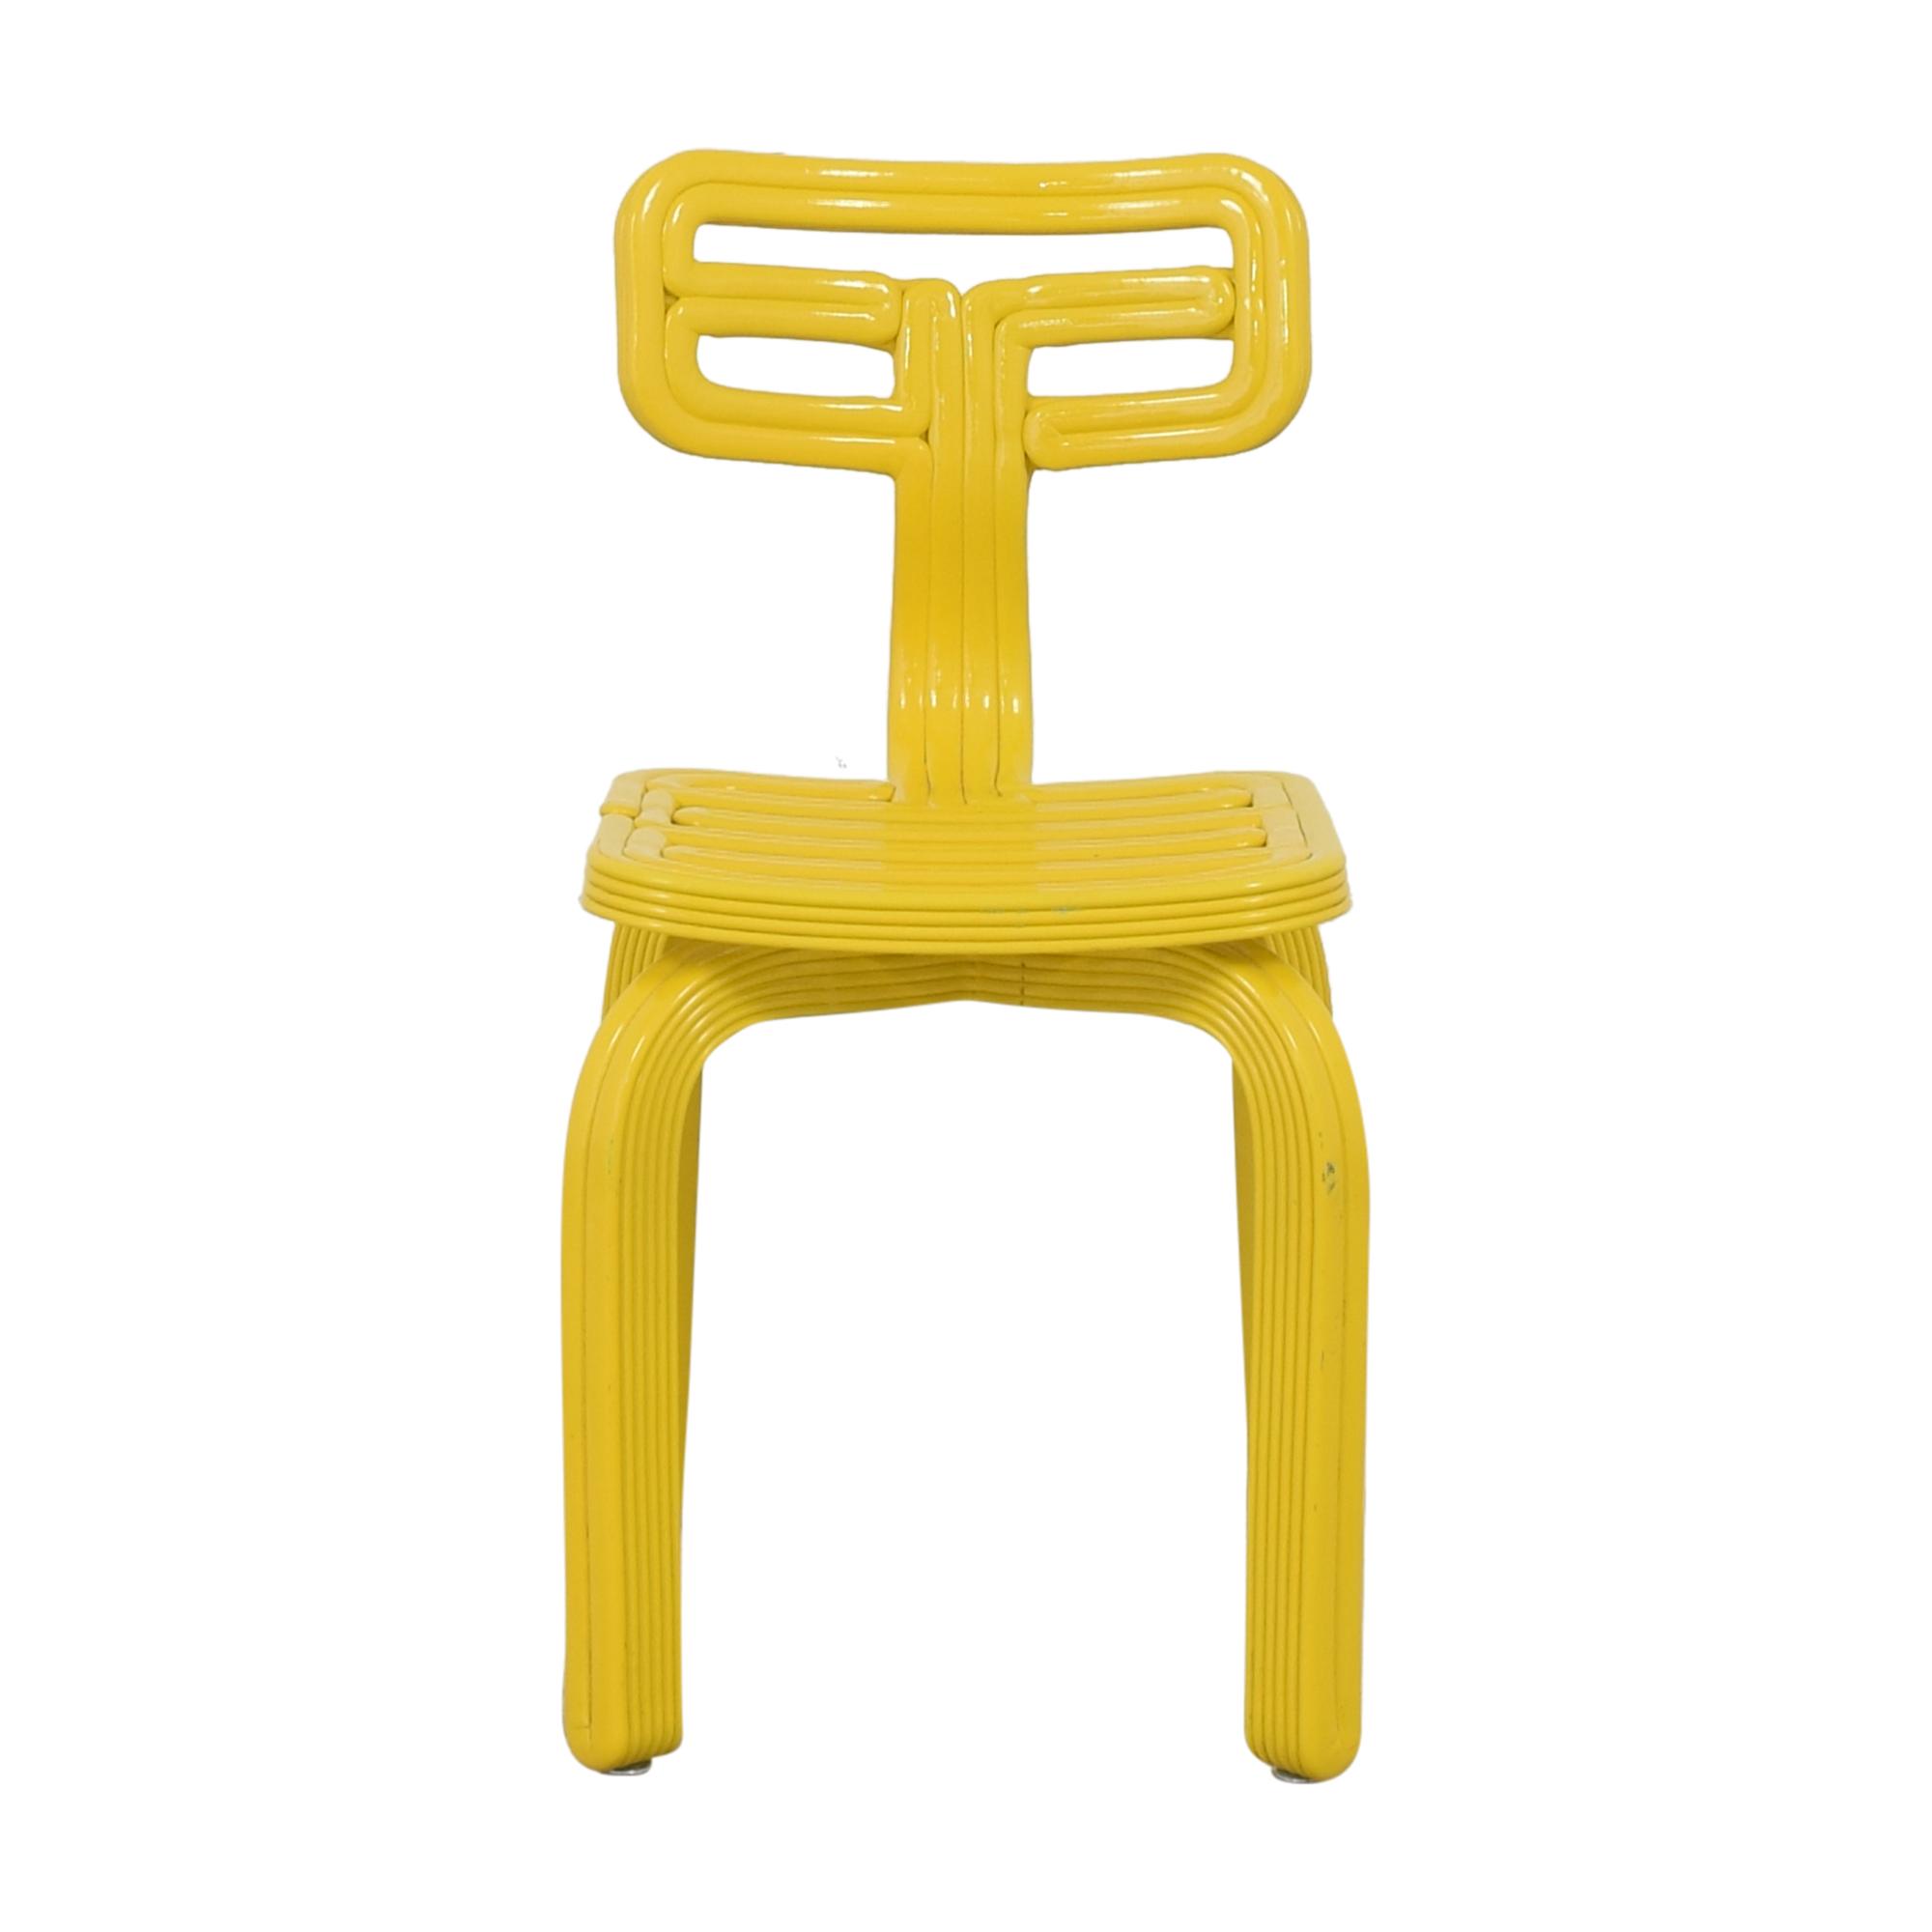 shop Dirk Vander Kooij Chubby Chair Dirk Vander Kooij